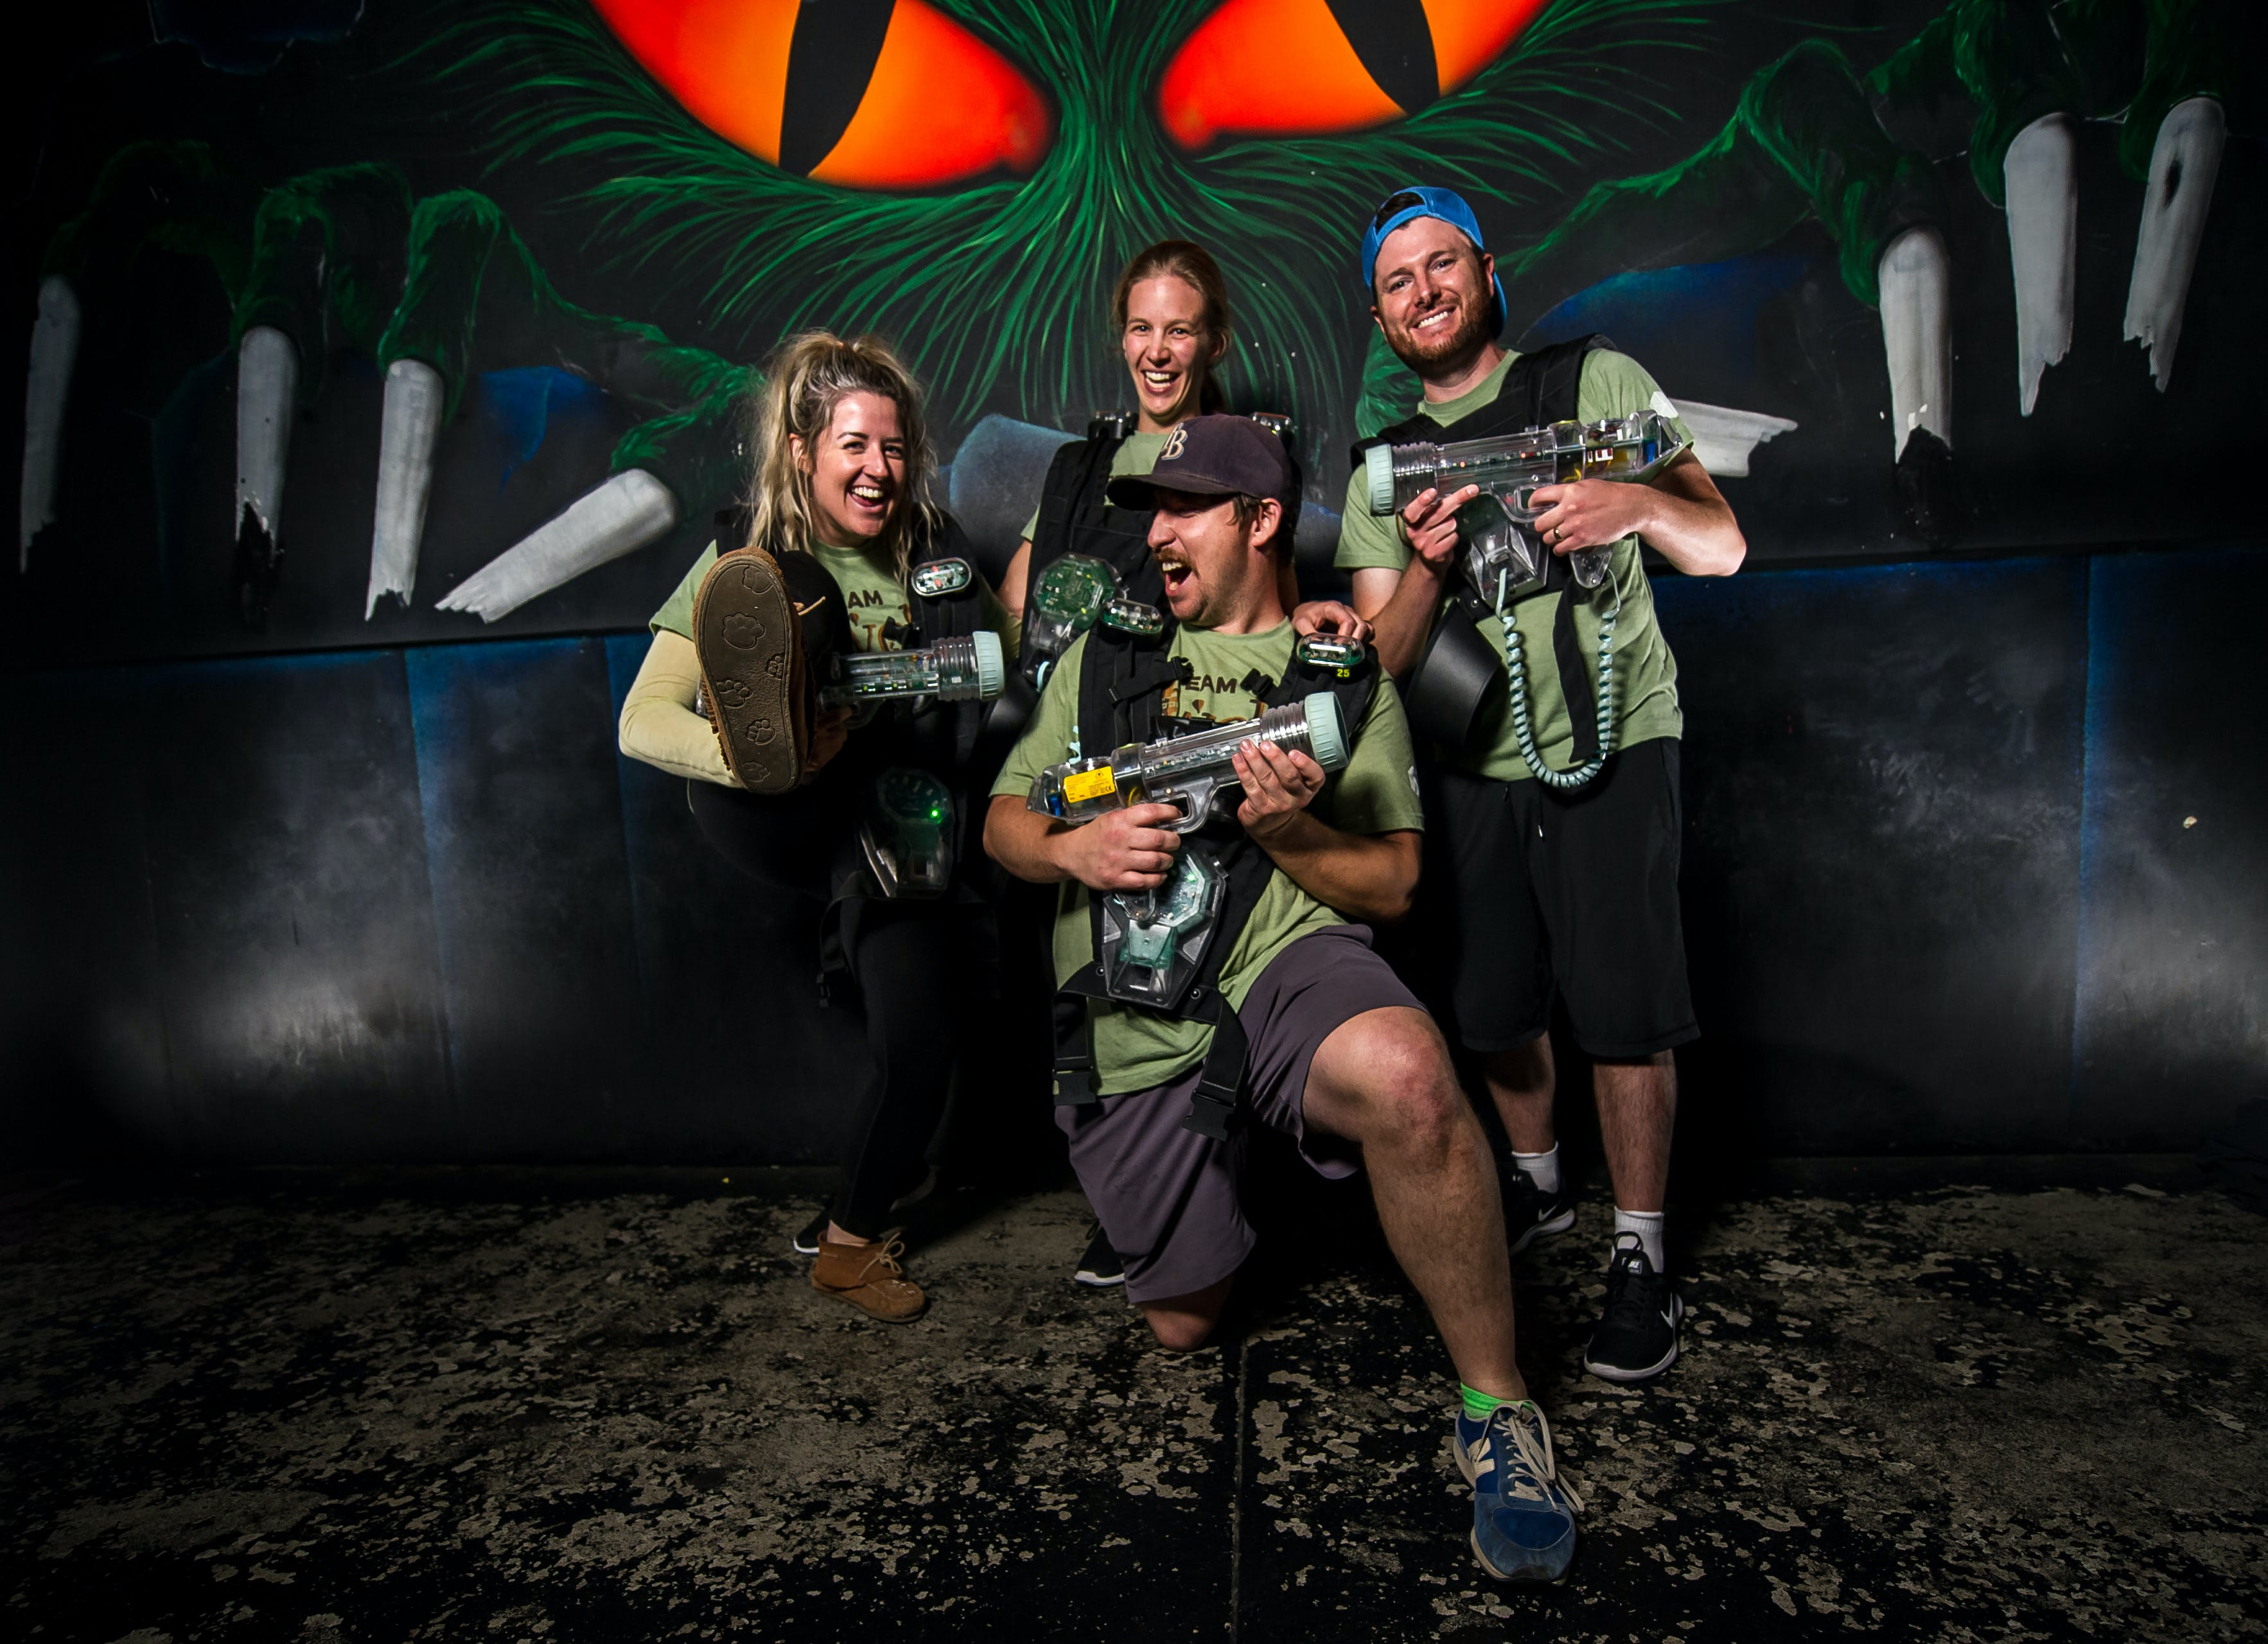 a team at laser tag